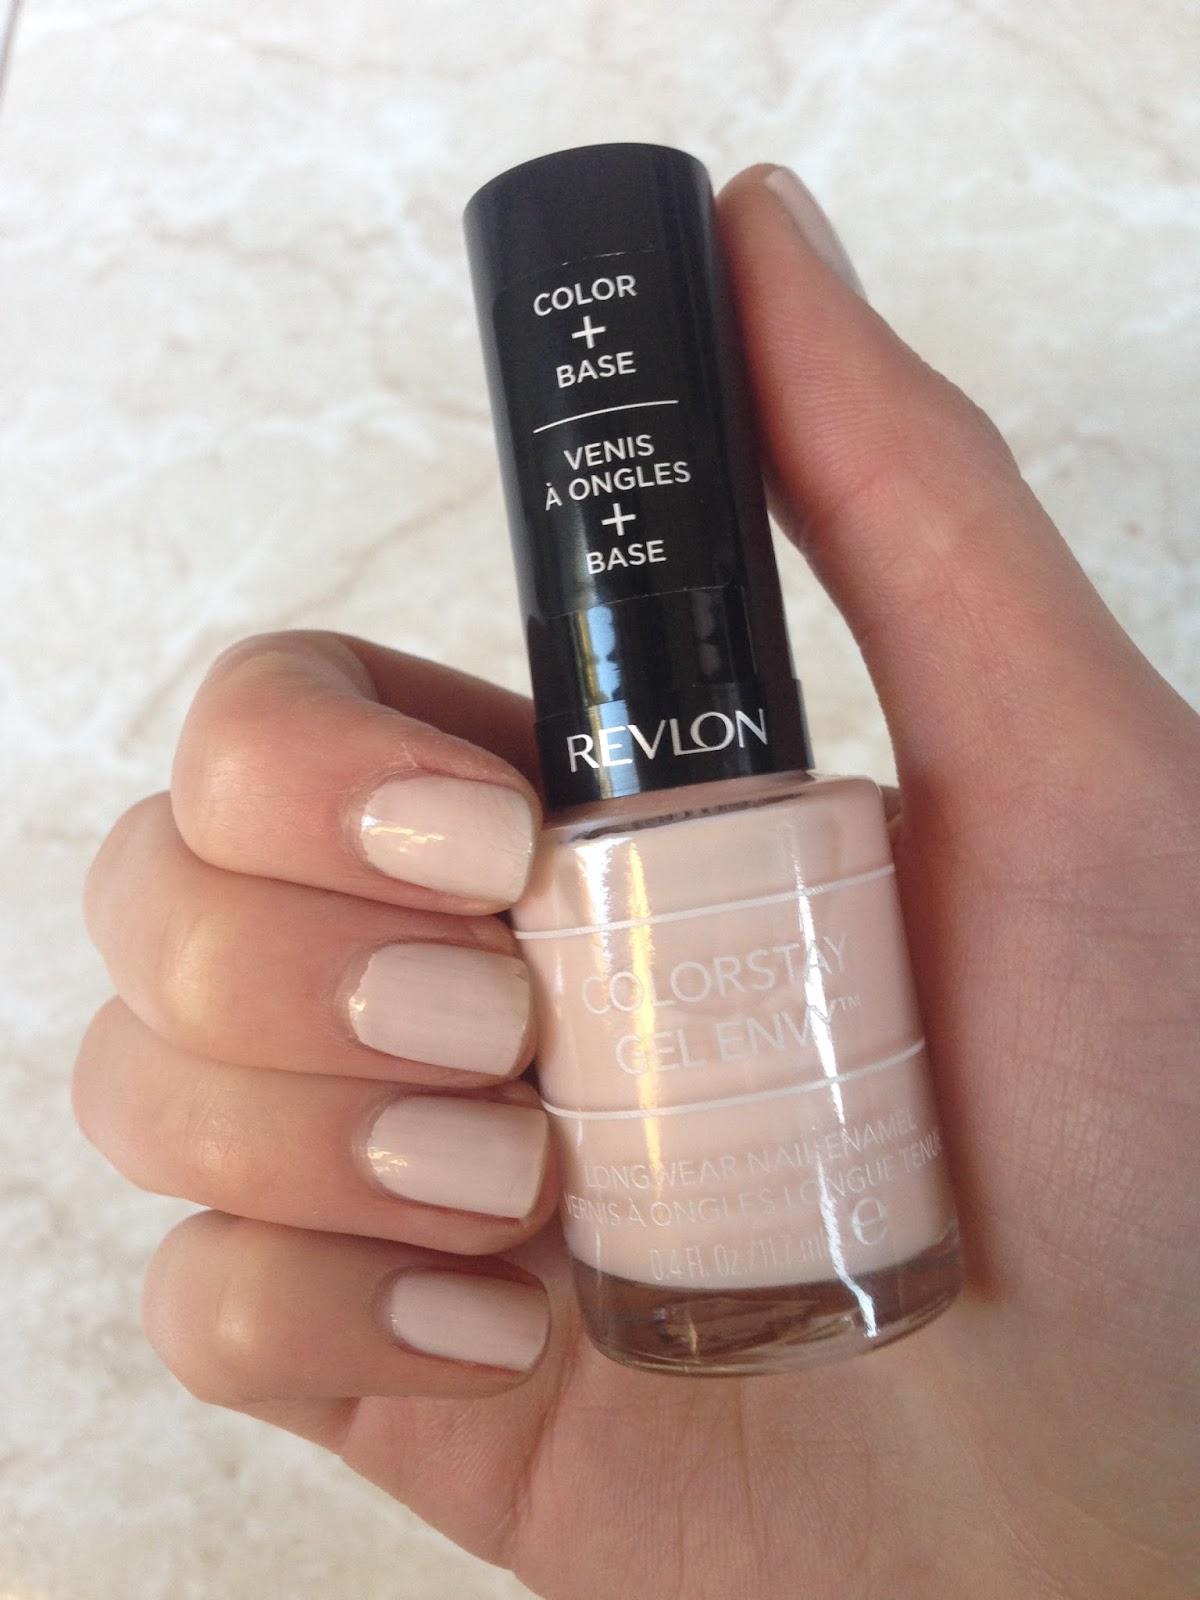 Review: Revlon Colorstay Gel Envy Nail Polish   Classically Contemporary revlon gel nail polish remover